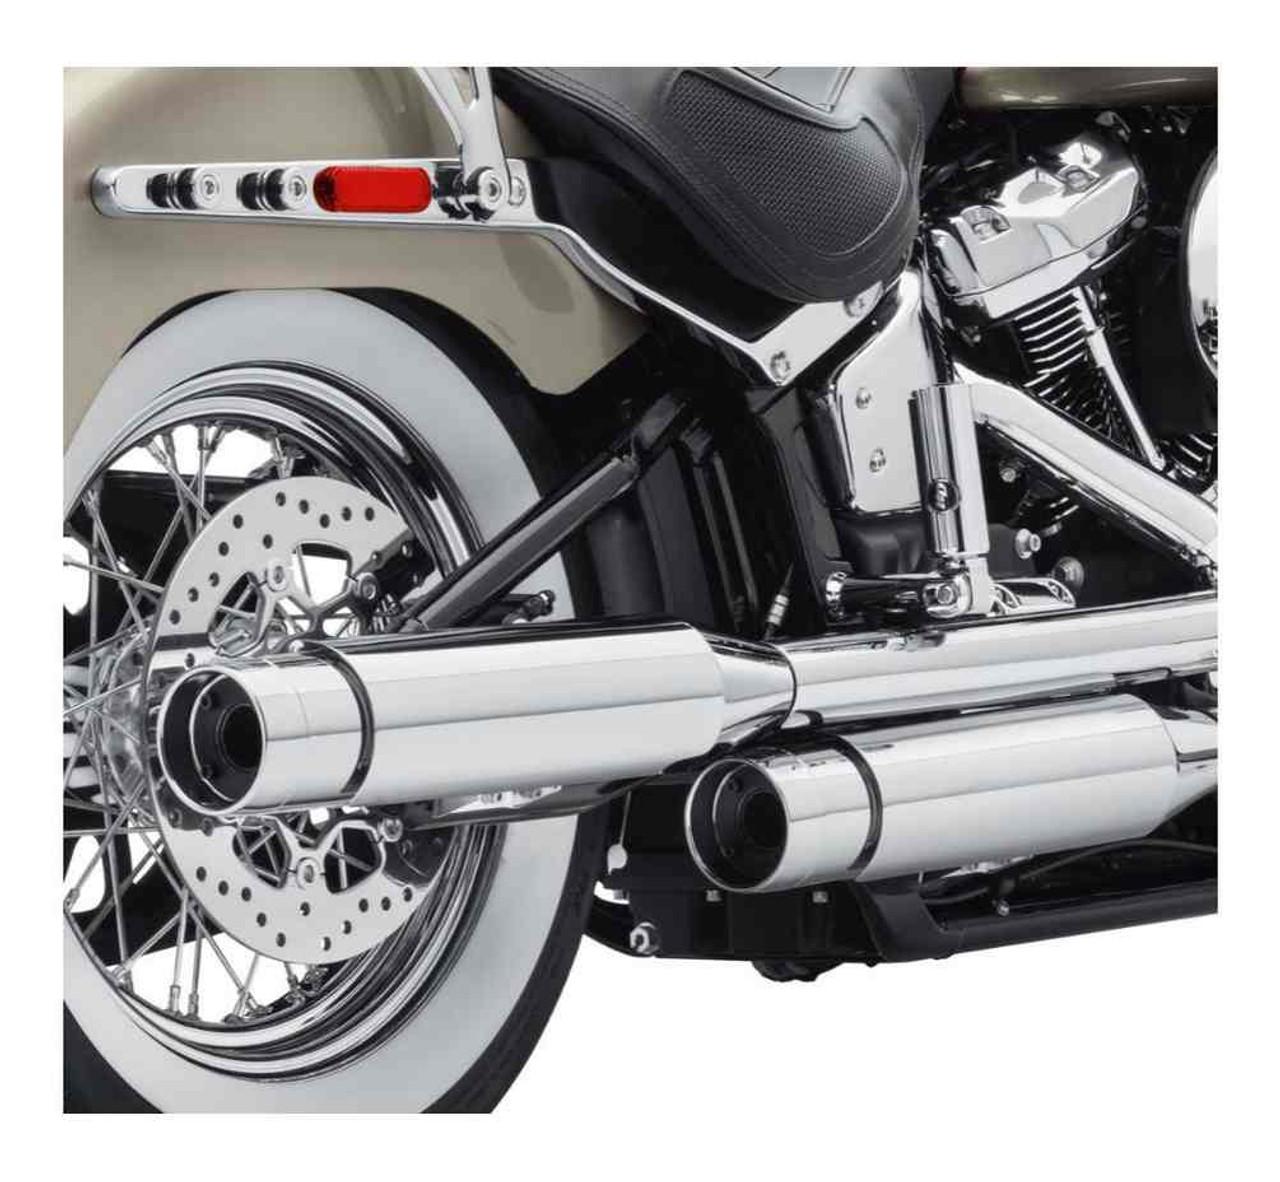 harley davidson screamin eagle street cannon mufflers short domestic 64900636